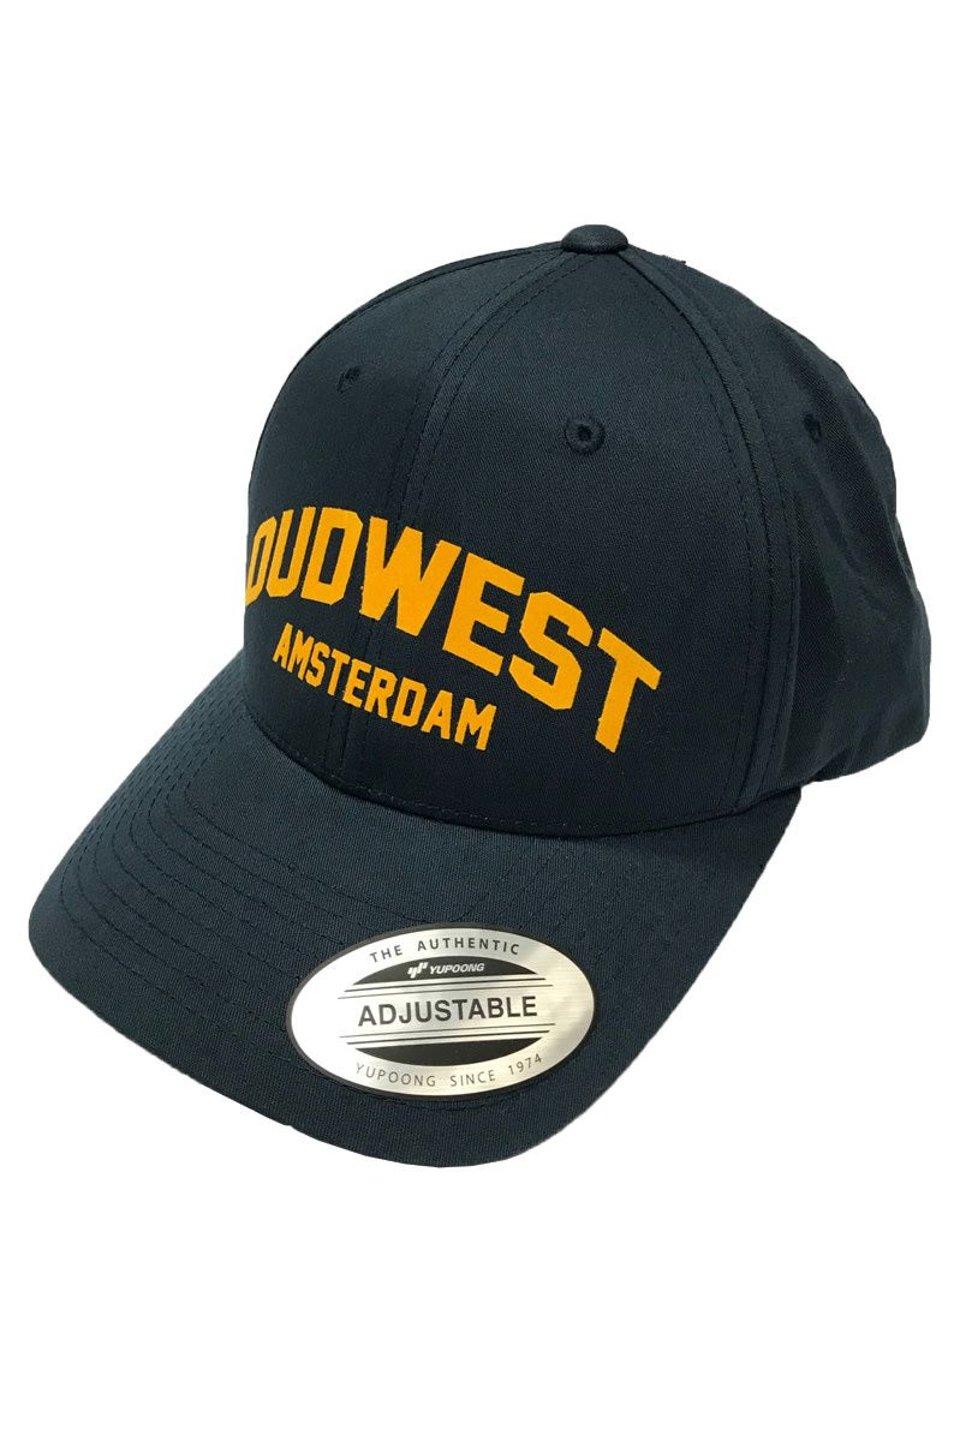 Oud-West Cap - Trucker